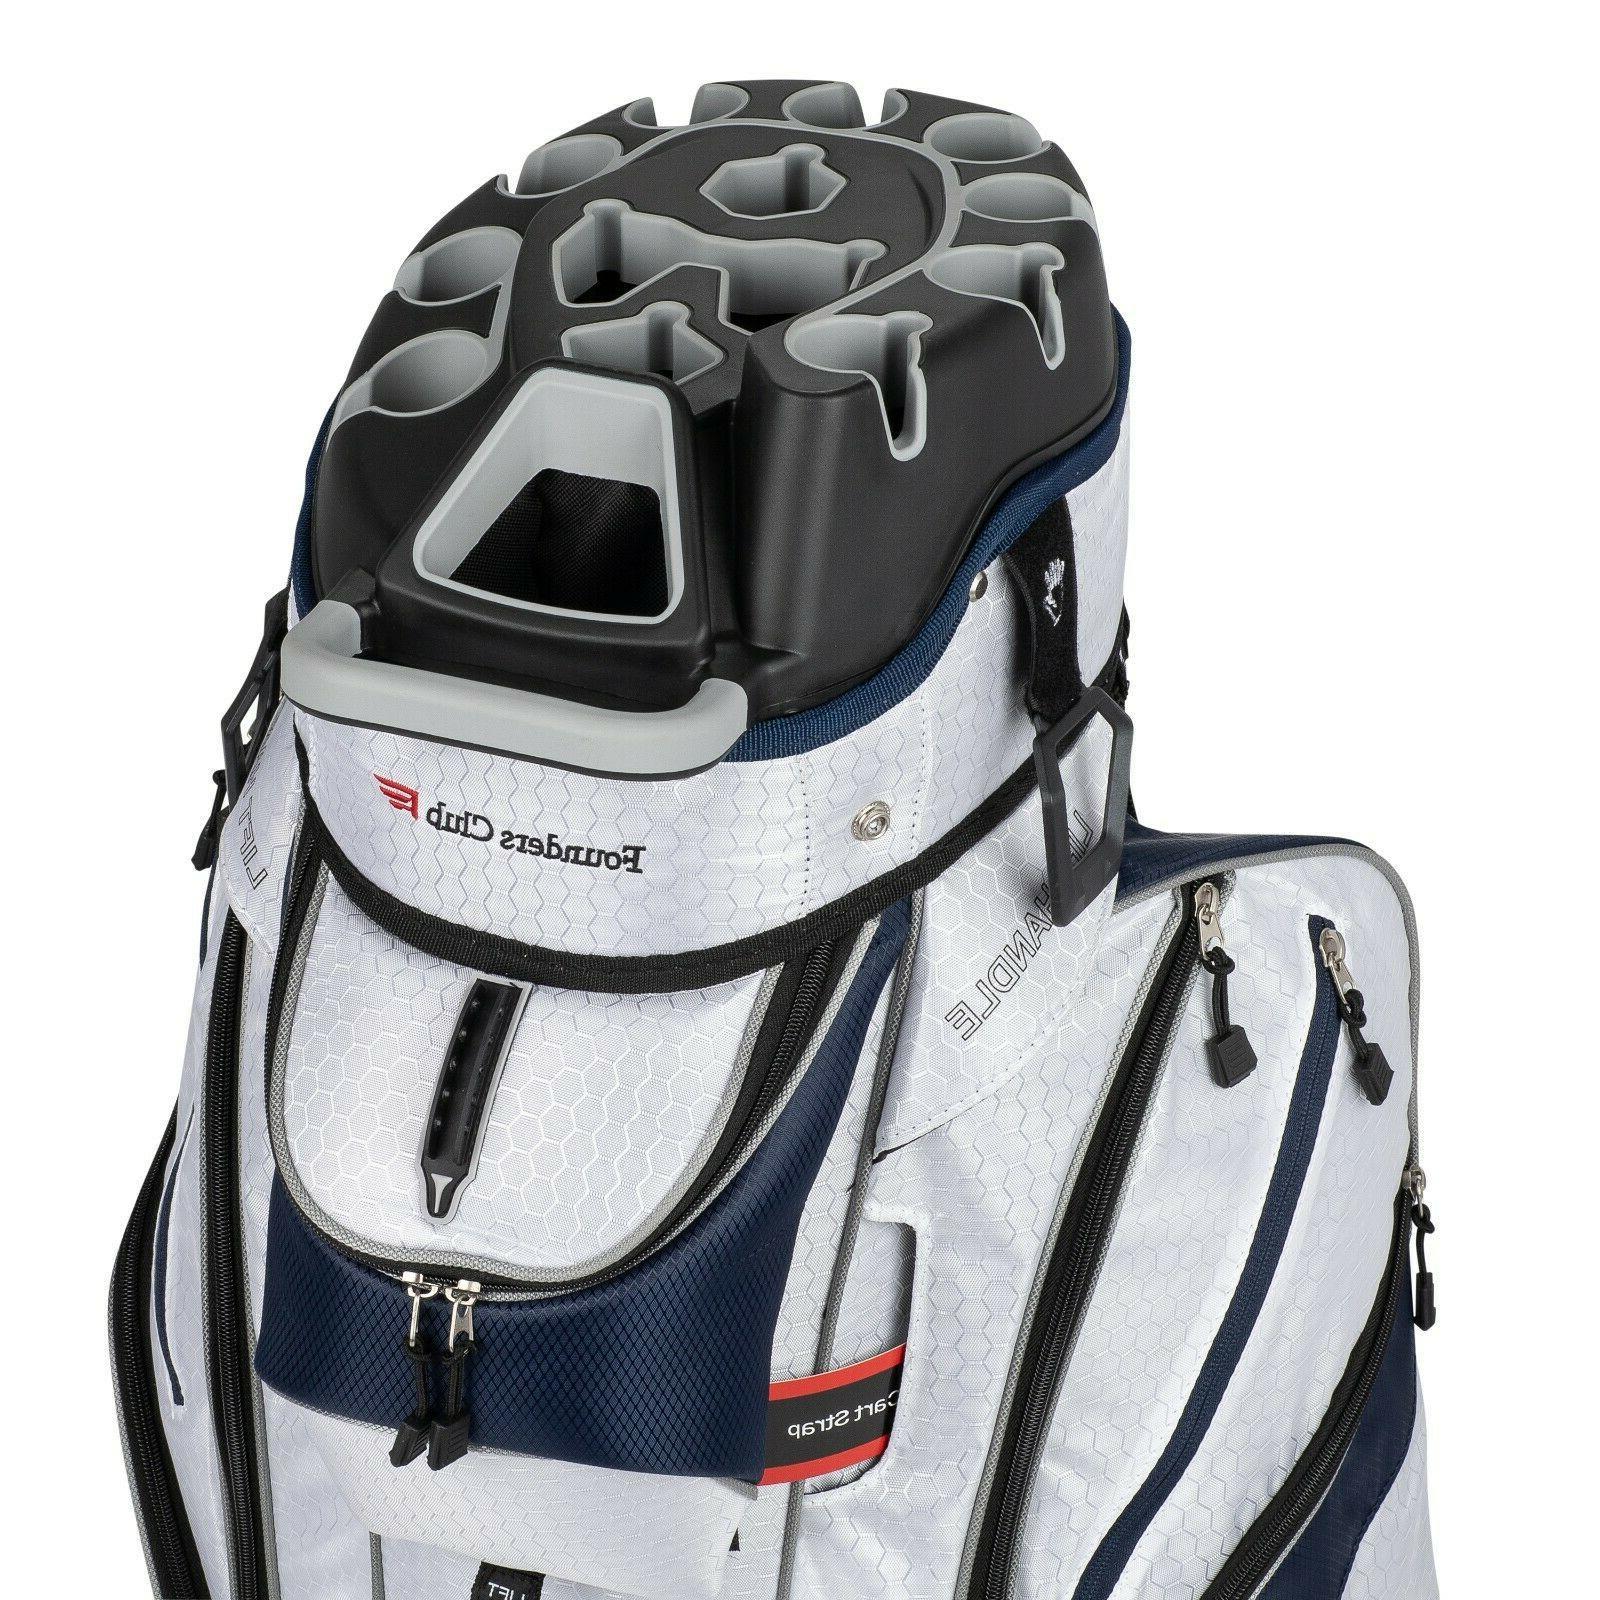 Founders 3G Way Organizer Top Golf Cart Bag with Full Length